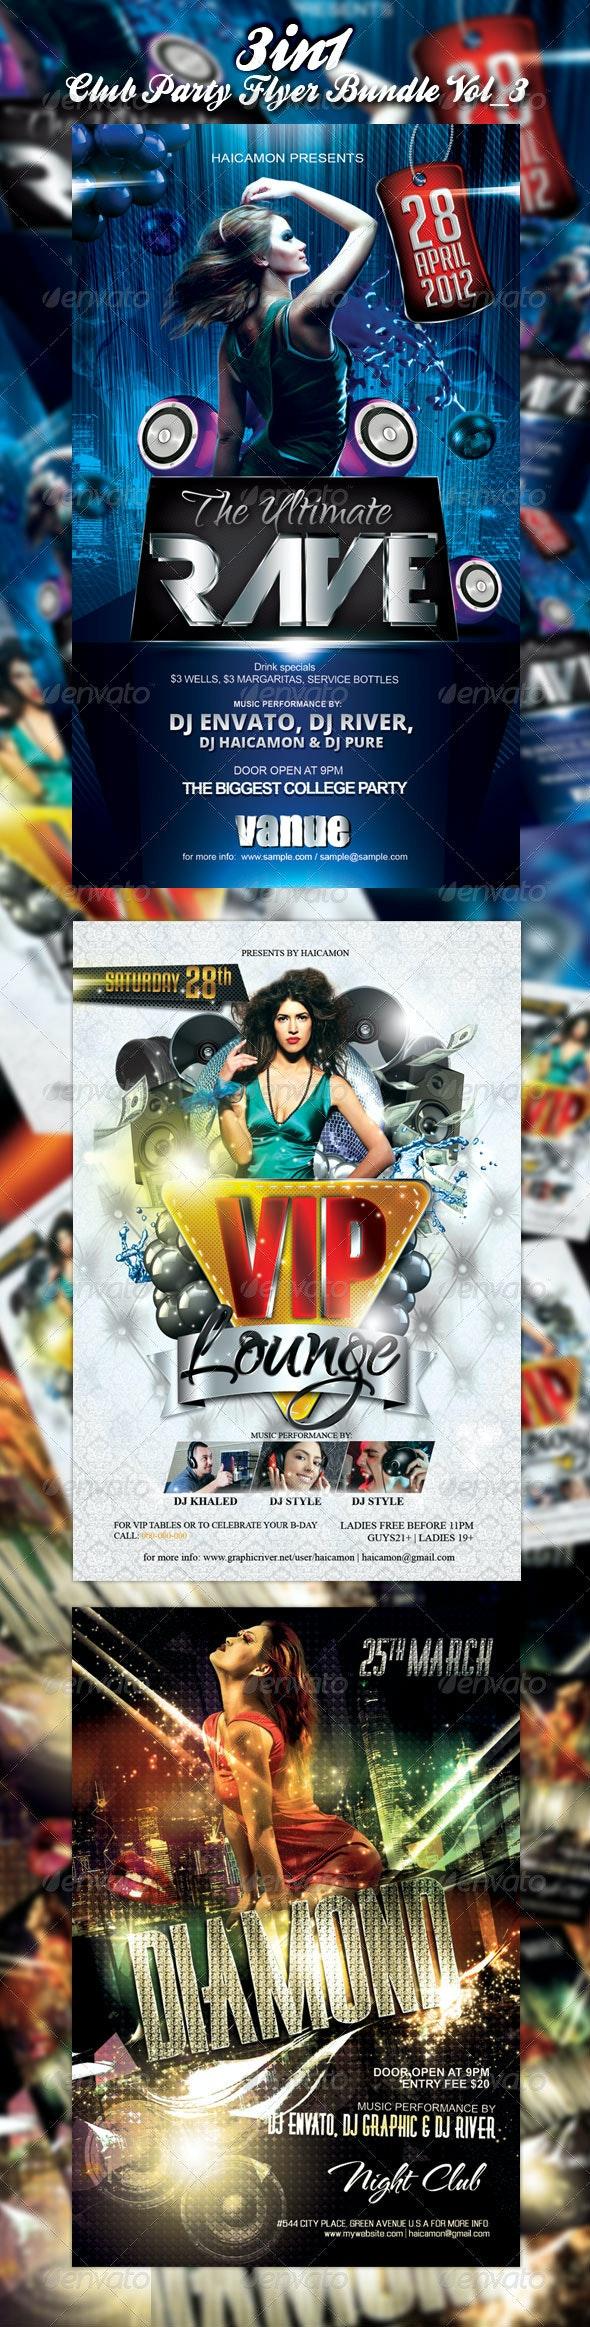 Club/Event Party Flyer Bundle Vol_3 - Events Flyers